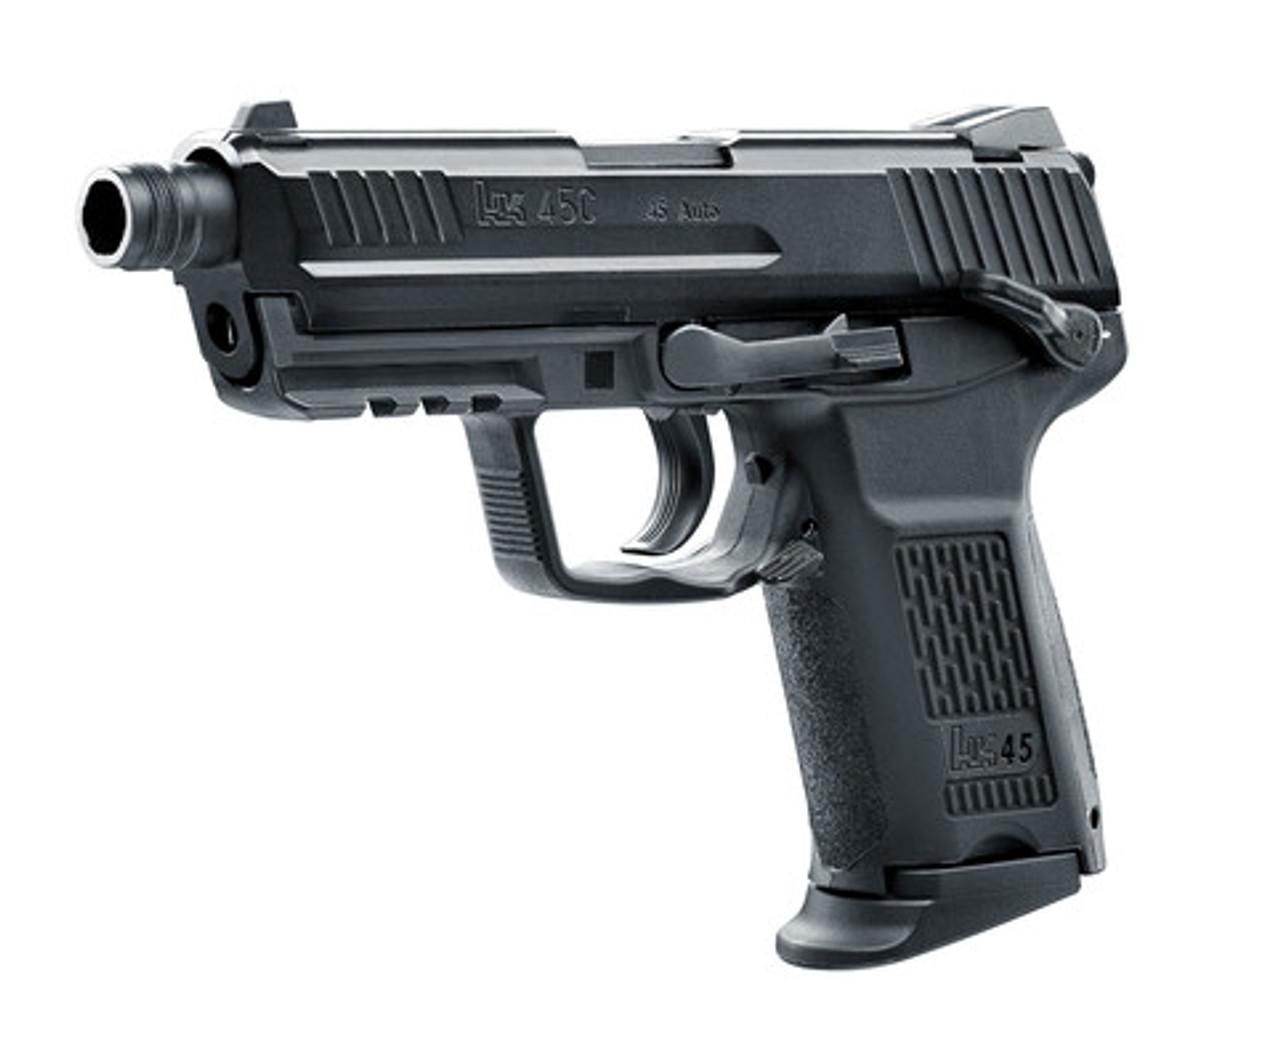 Elite Force HK HK45CT Gas Blowback Pistol (Black)